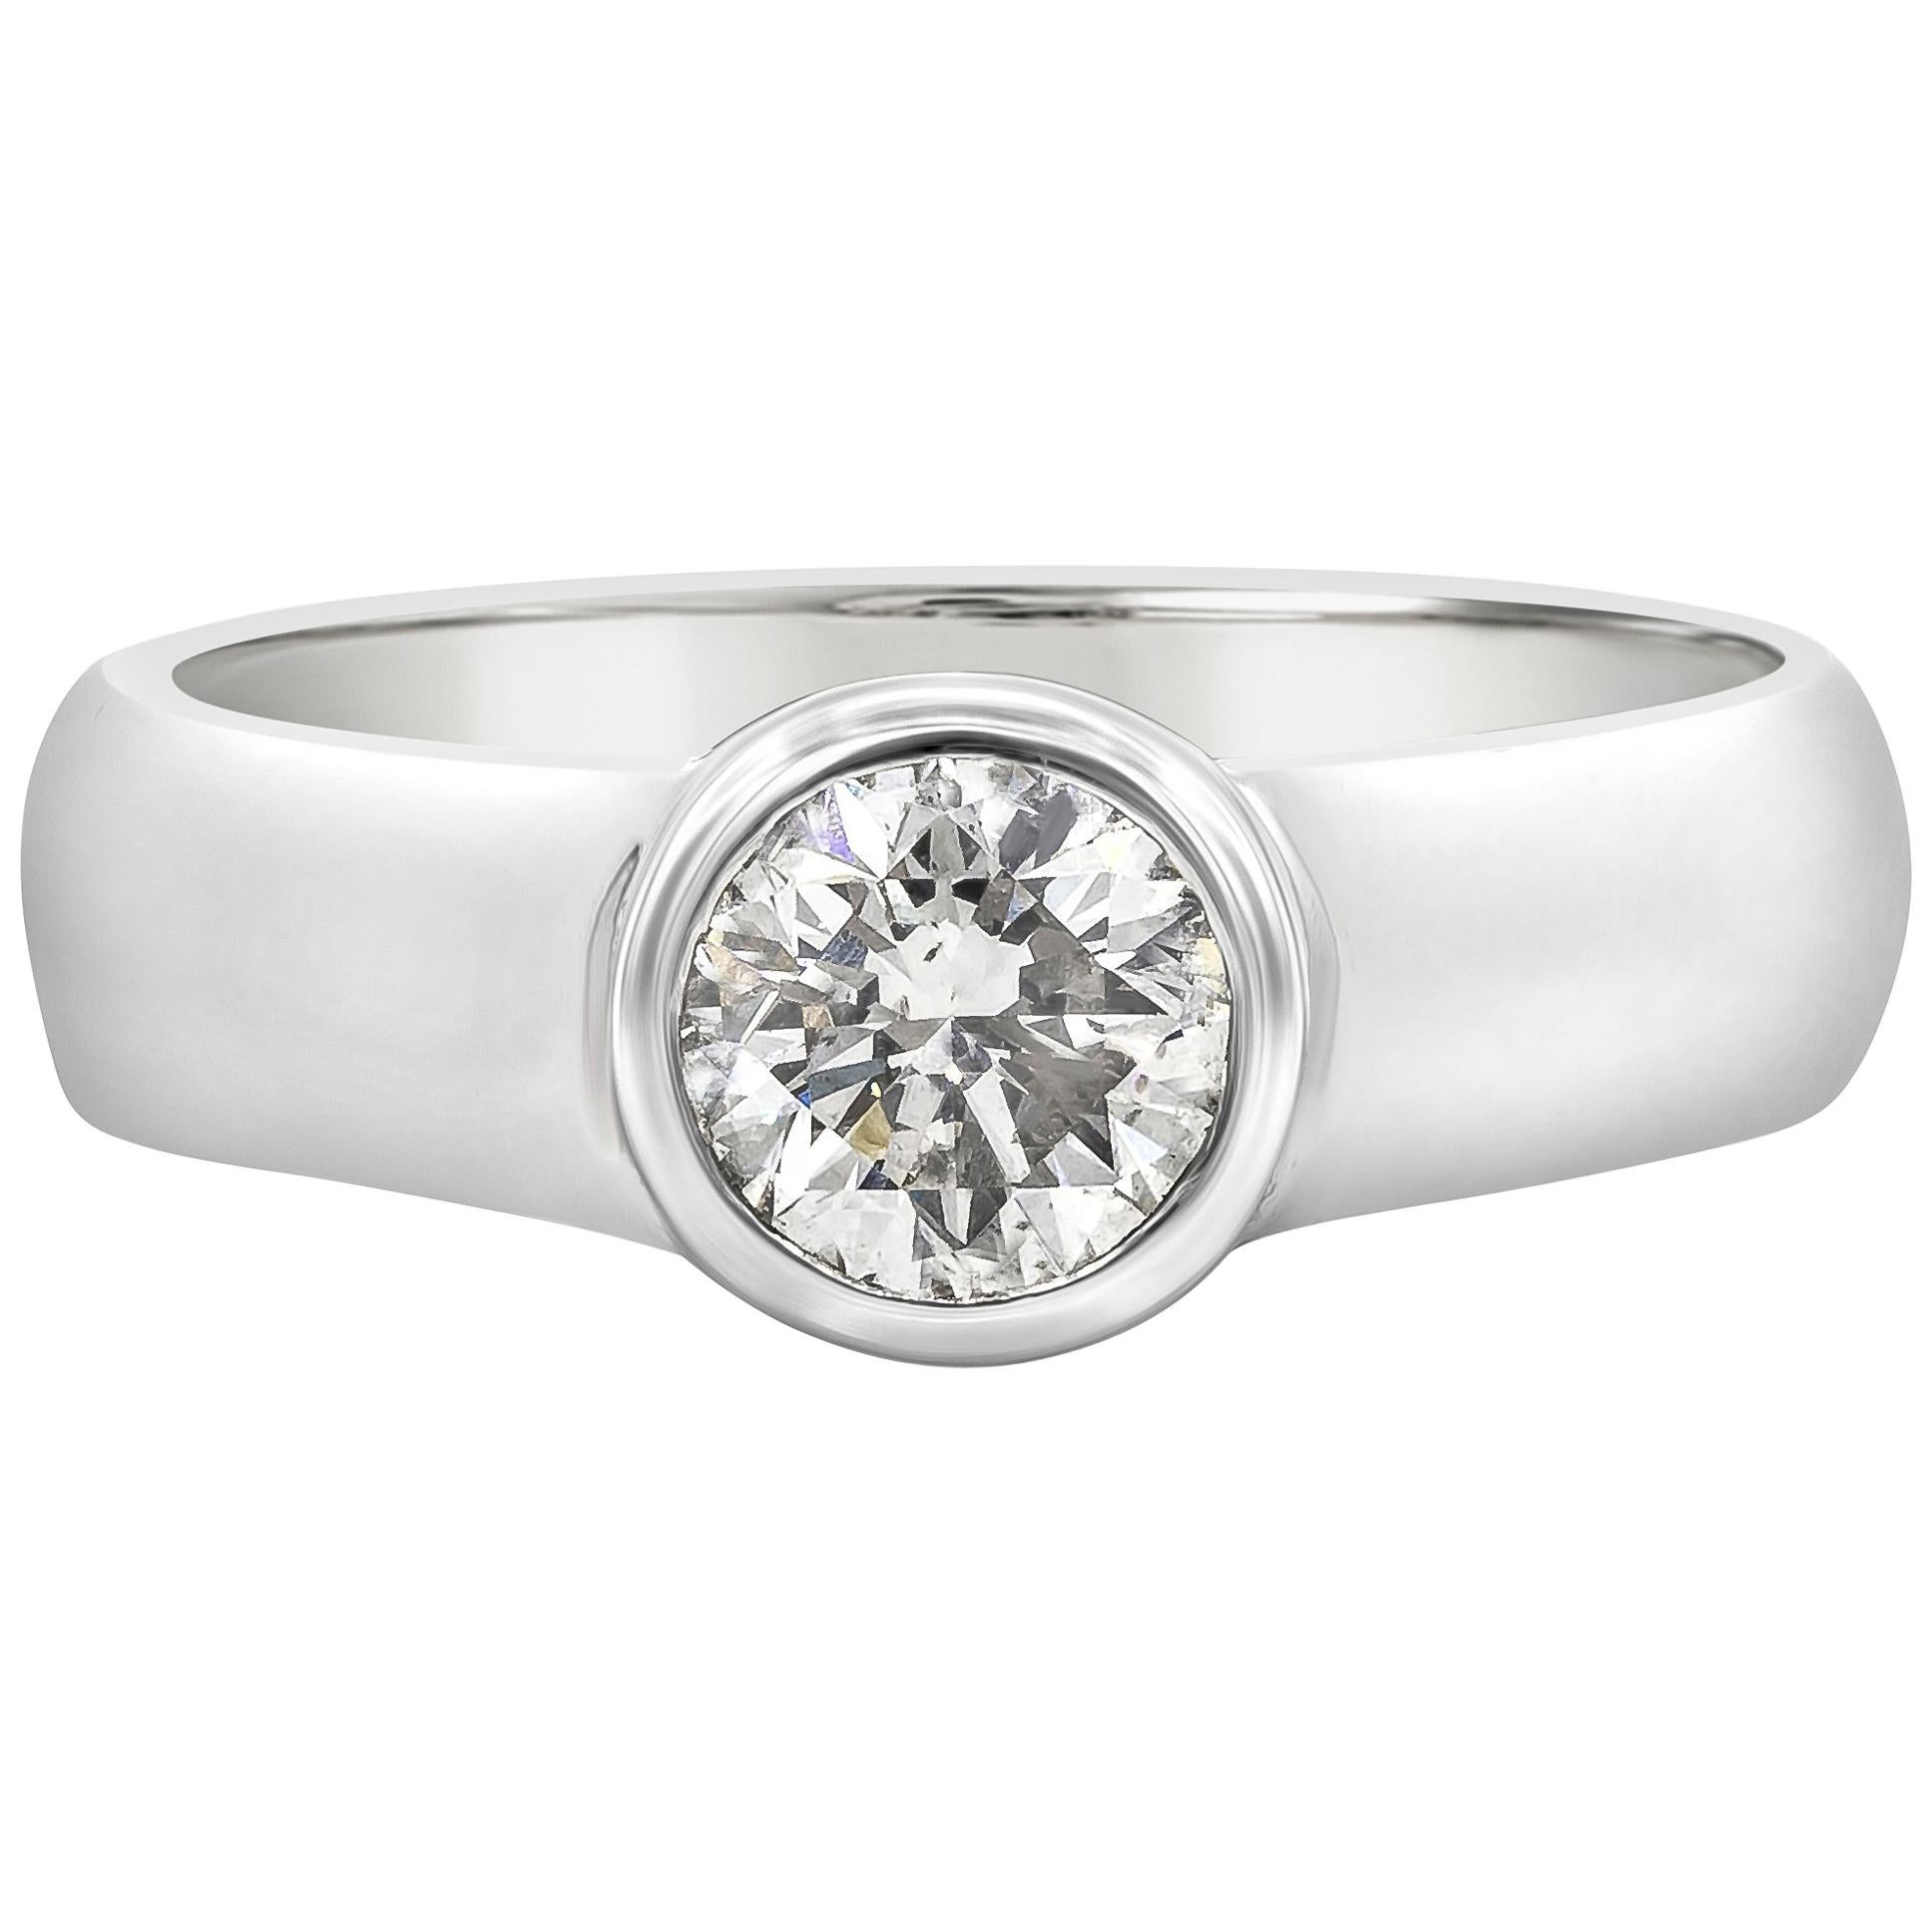 0.81 Carat Round Diamond Bezel Solitaire Engagement Ring